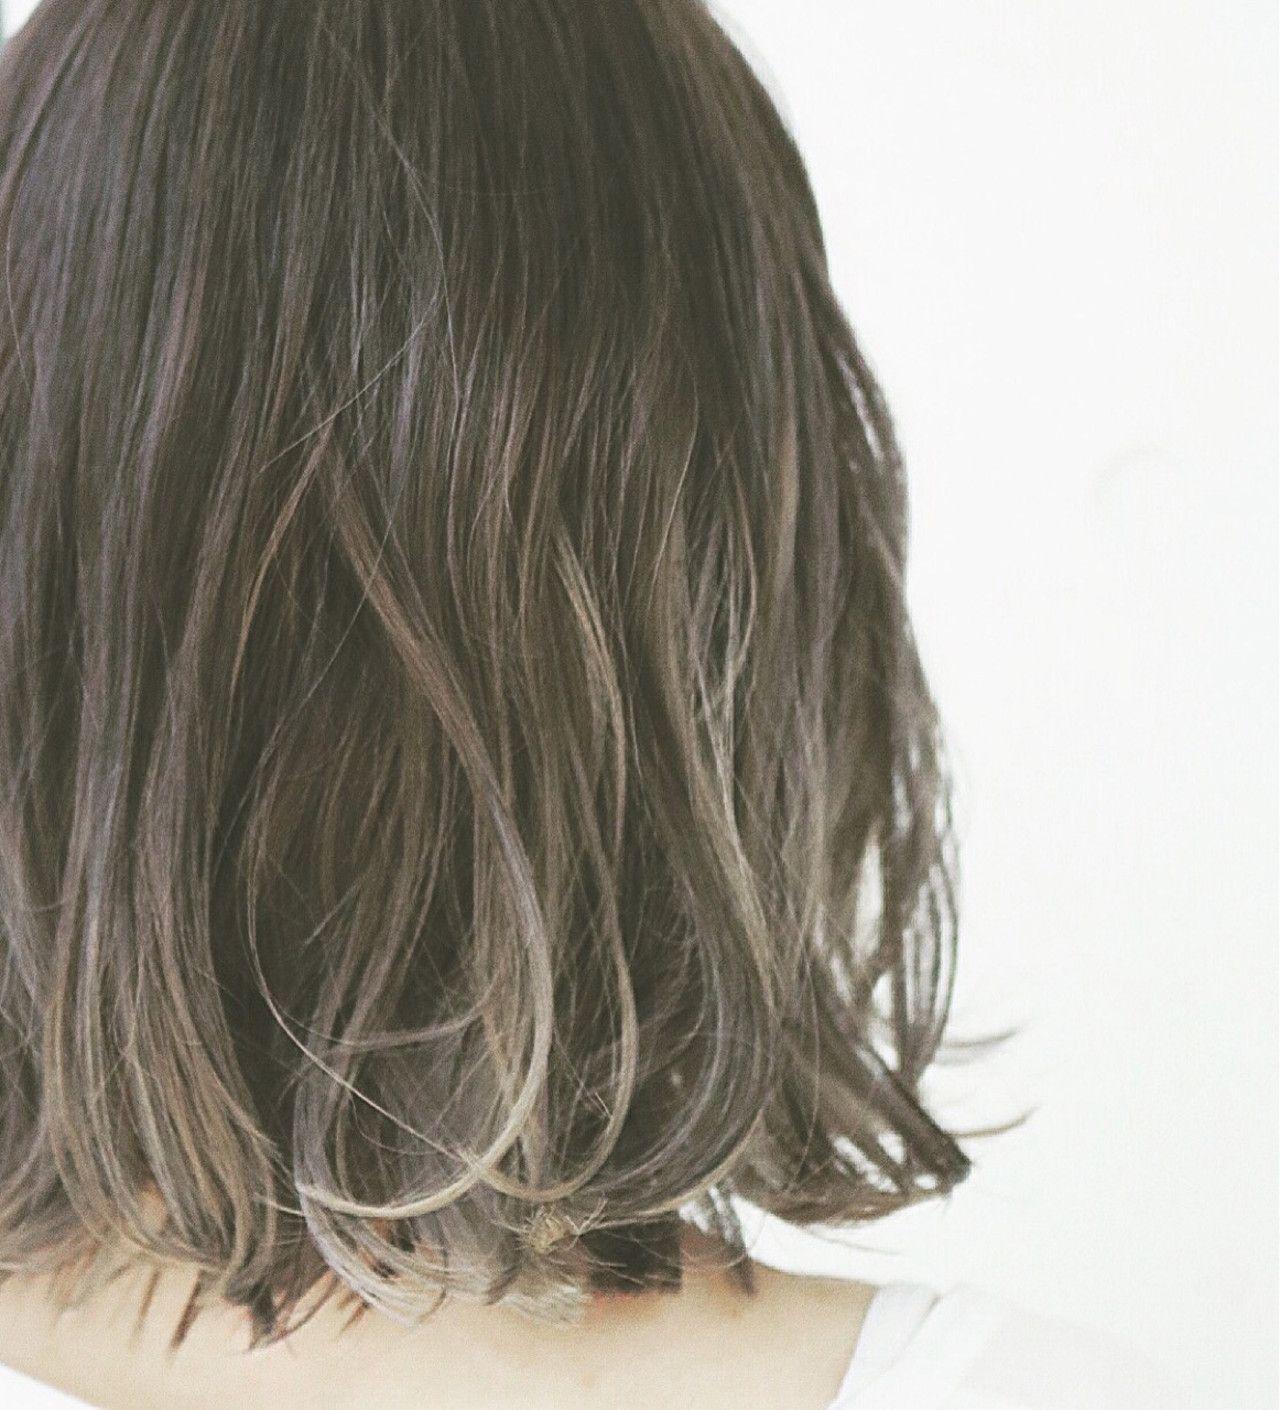 Yumiko Takada ショートのヘアスタイル ヘアスタイル ロング ロングブラウンヘア